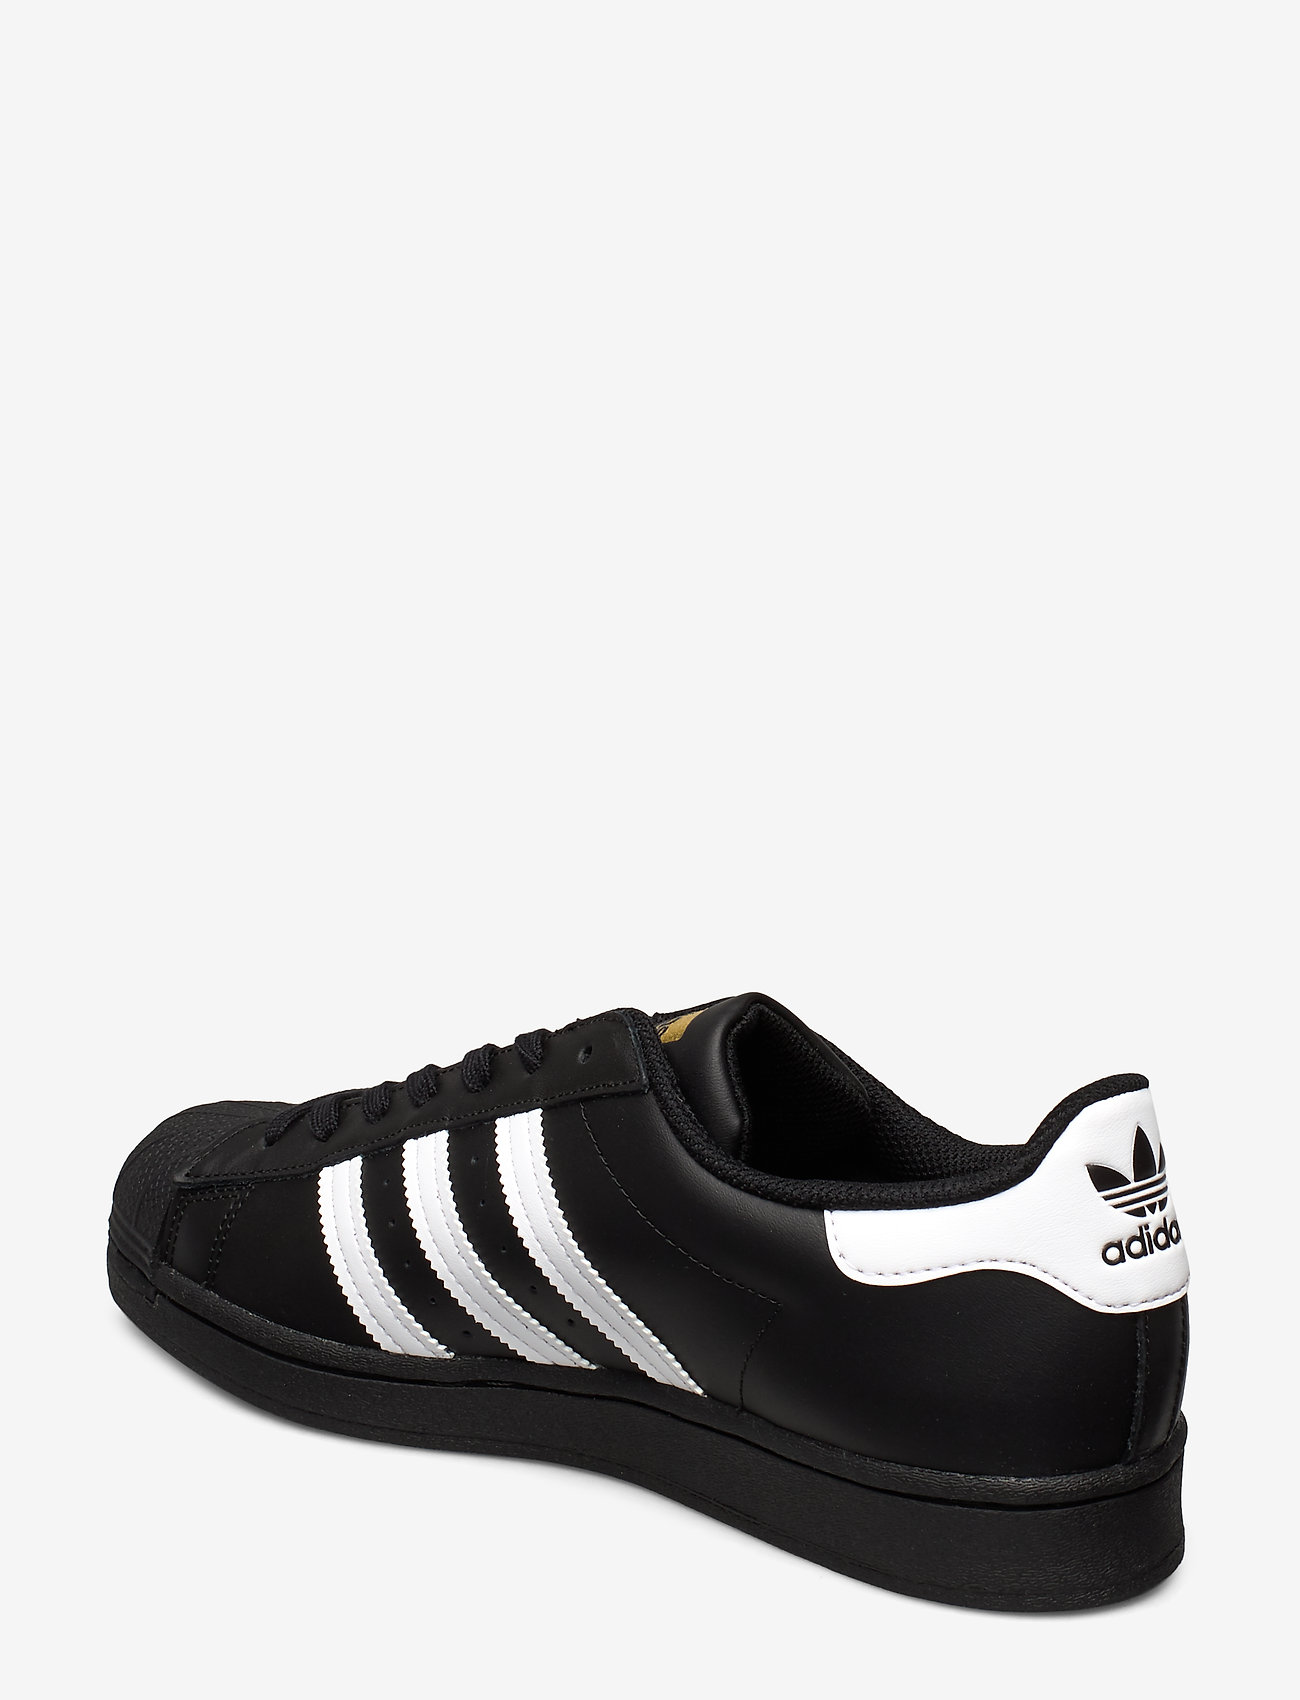 Superstar (Cblack/ftwwht/cblack) - adidas Originals